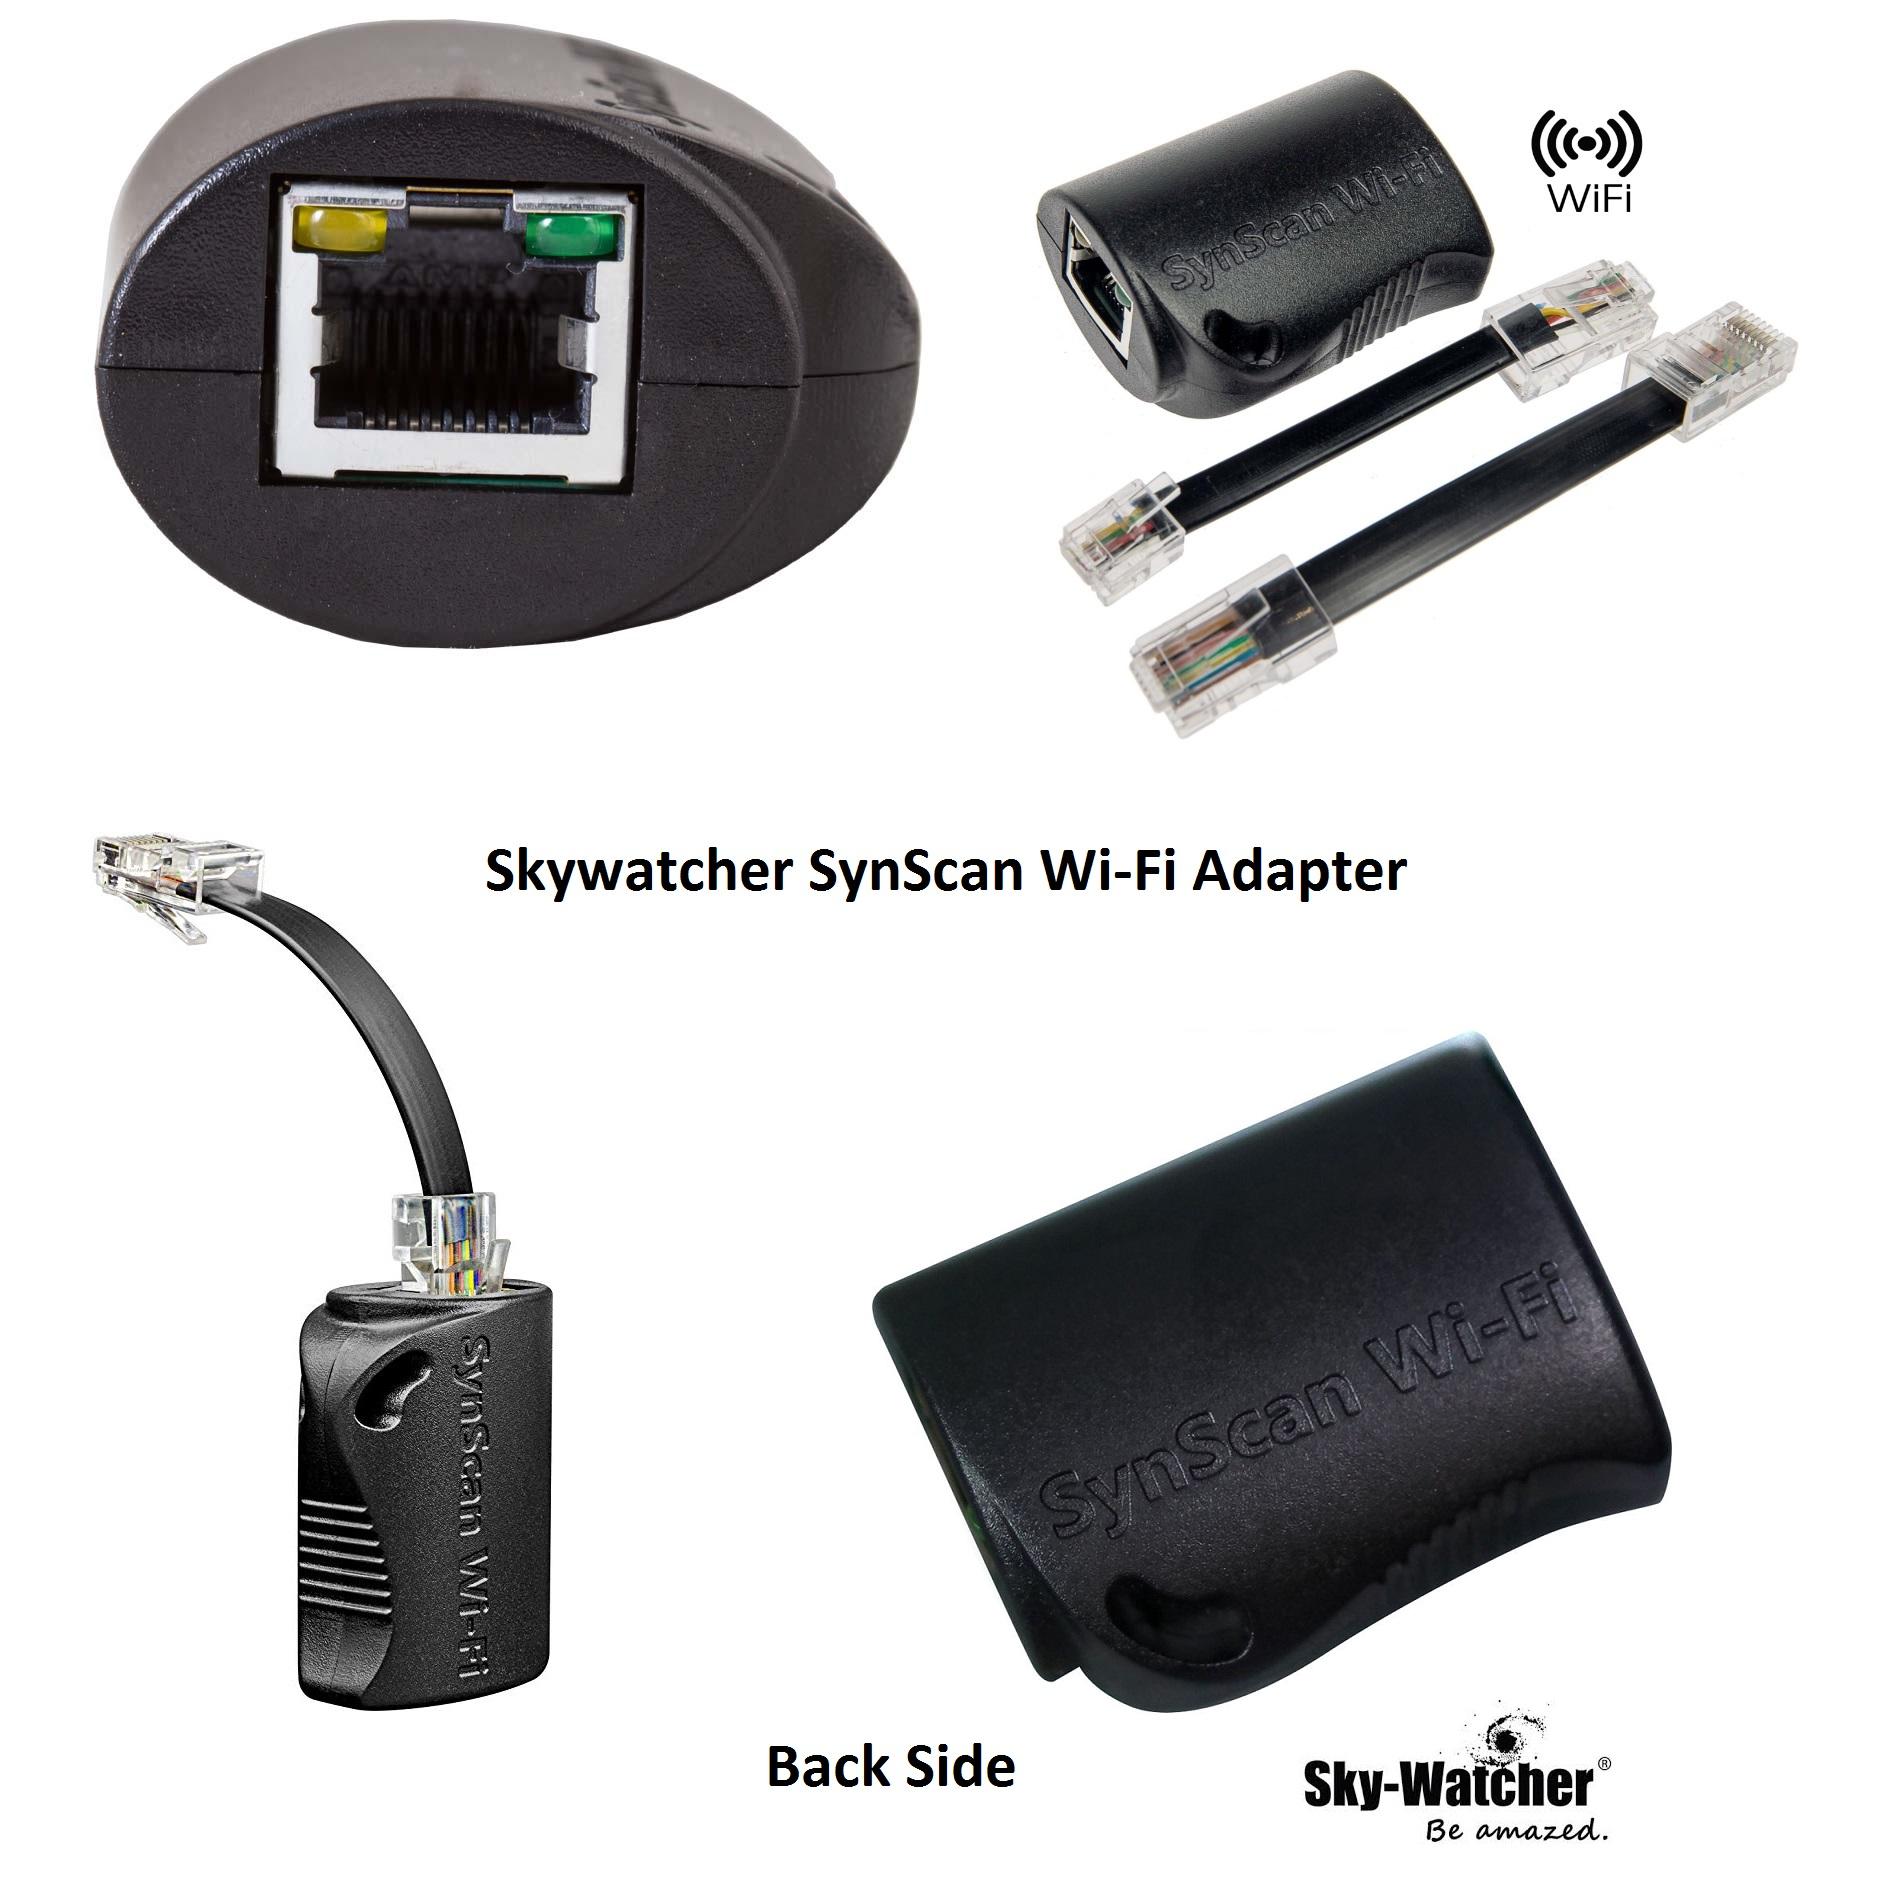 Nunudes Co Uk Fi: Skywatcher SynScan Wi-Fi Adapter